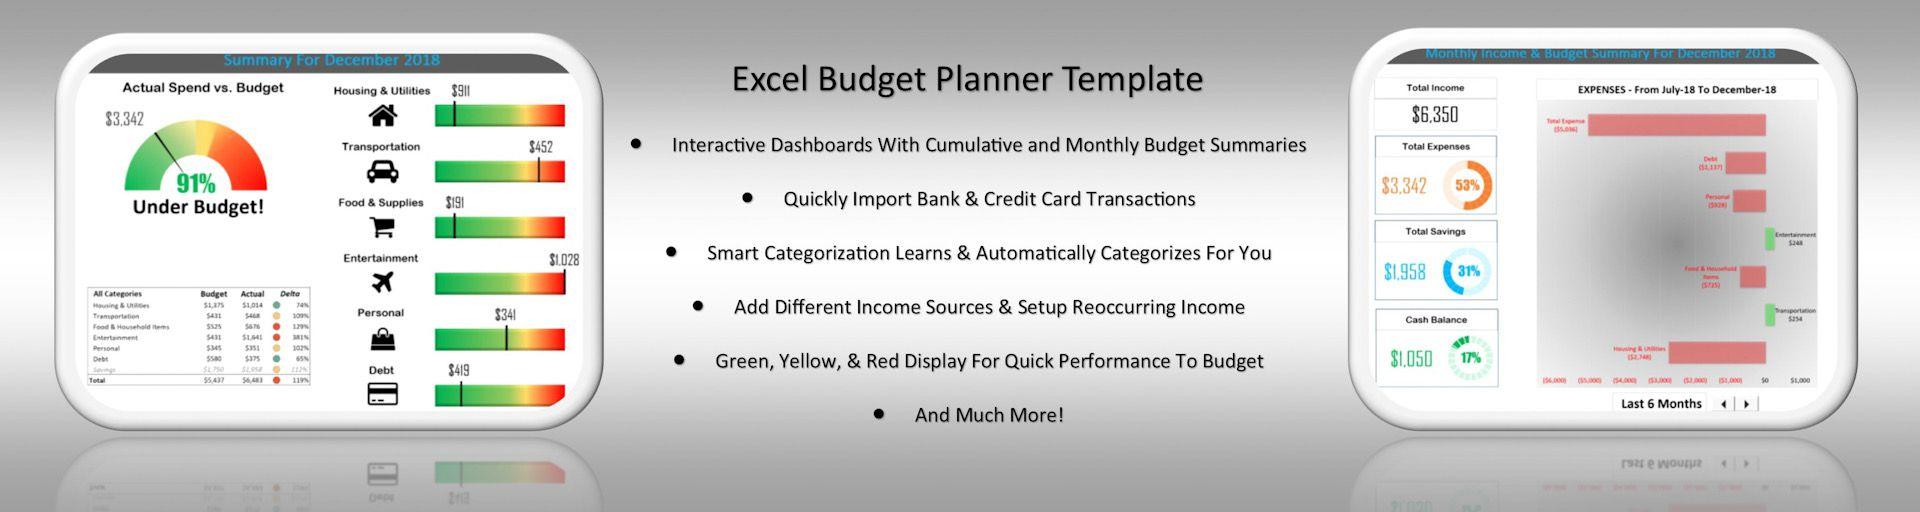 004 Frightening Excel Budget Spreadsheet Template Design  Tracker Free Household MonthlyFull